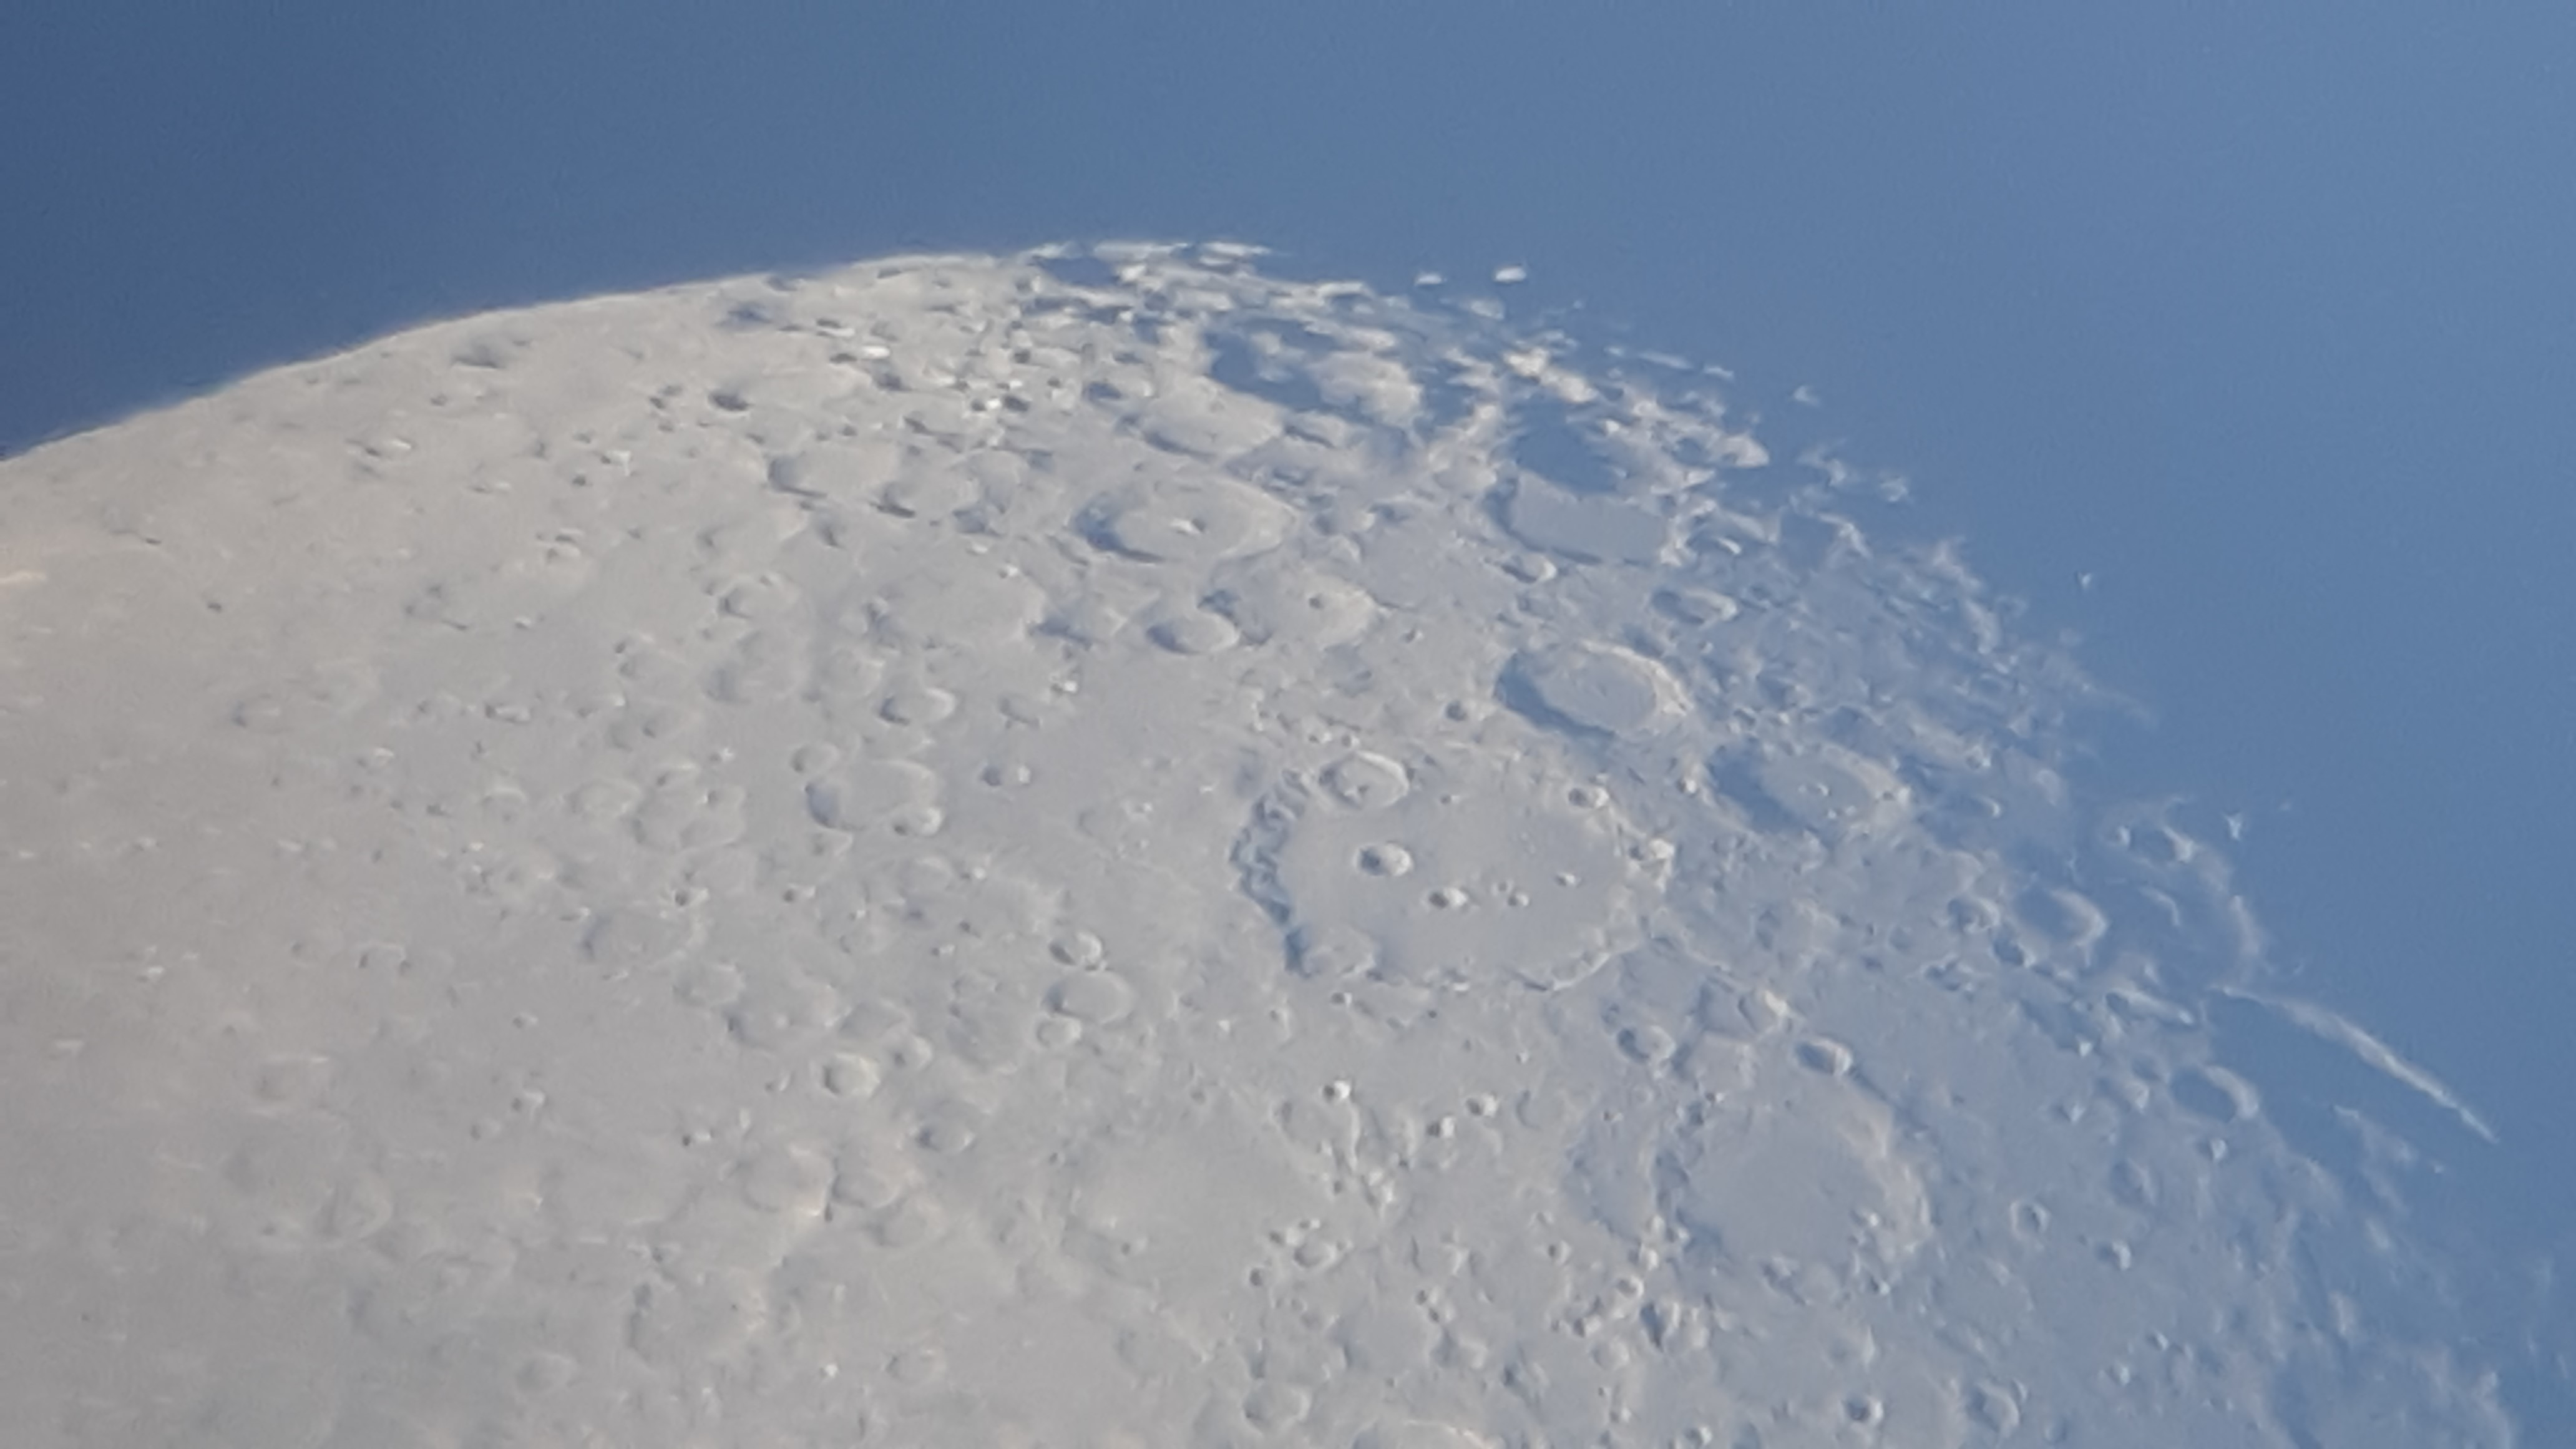 Moon photo taken through a telescope.